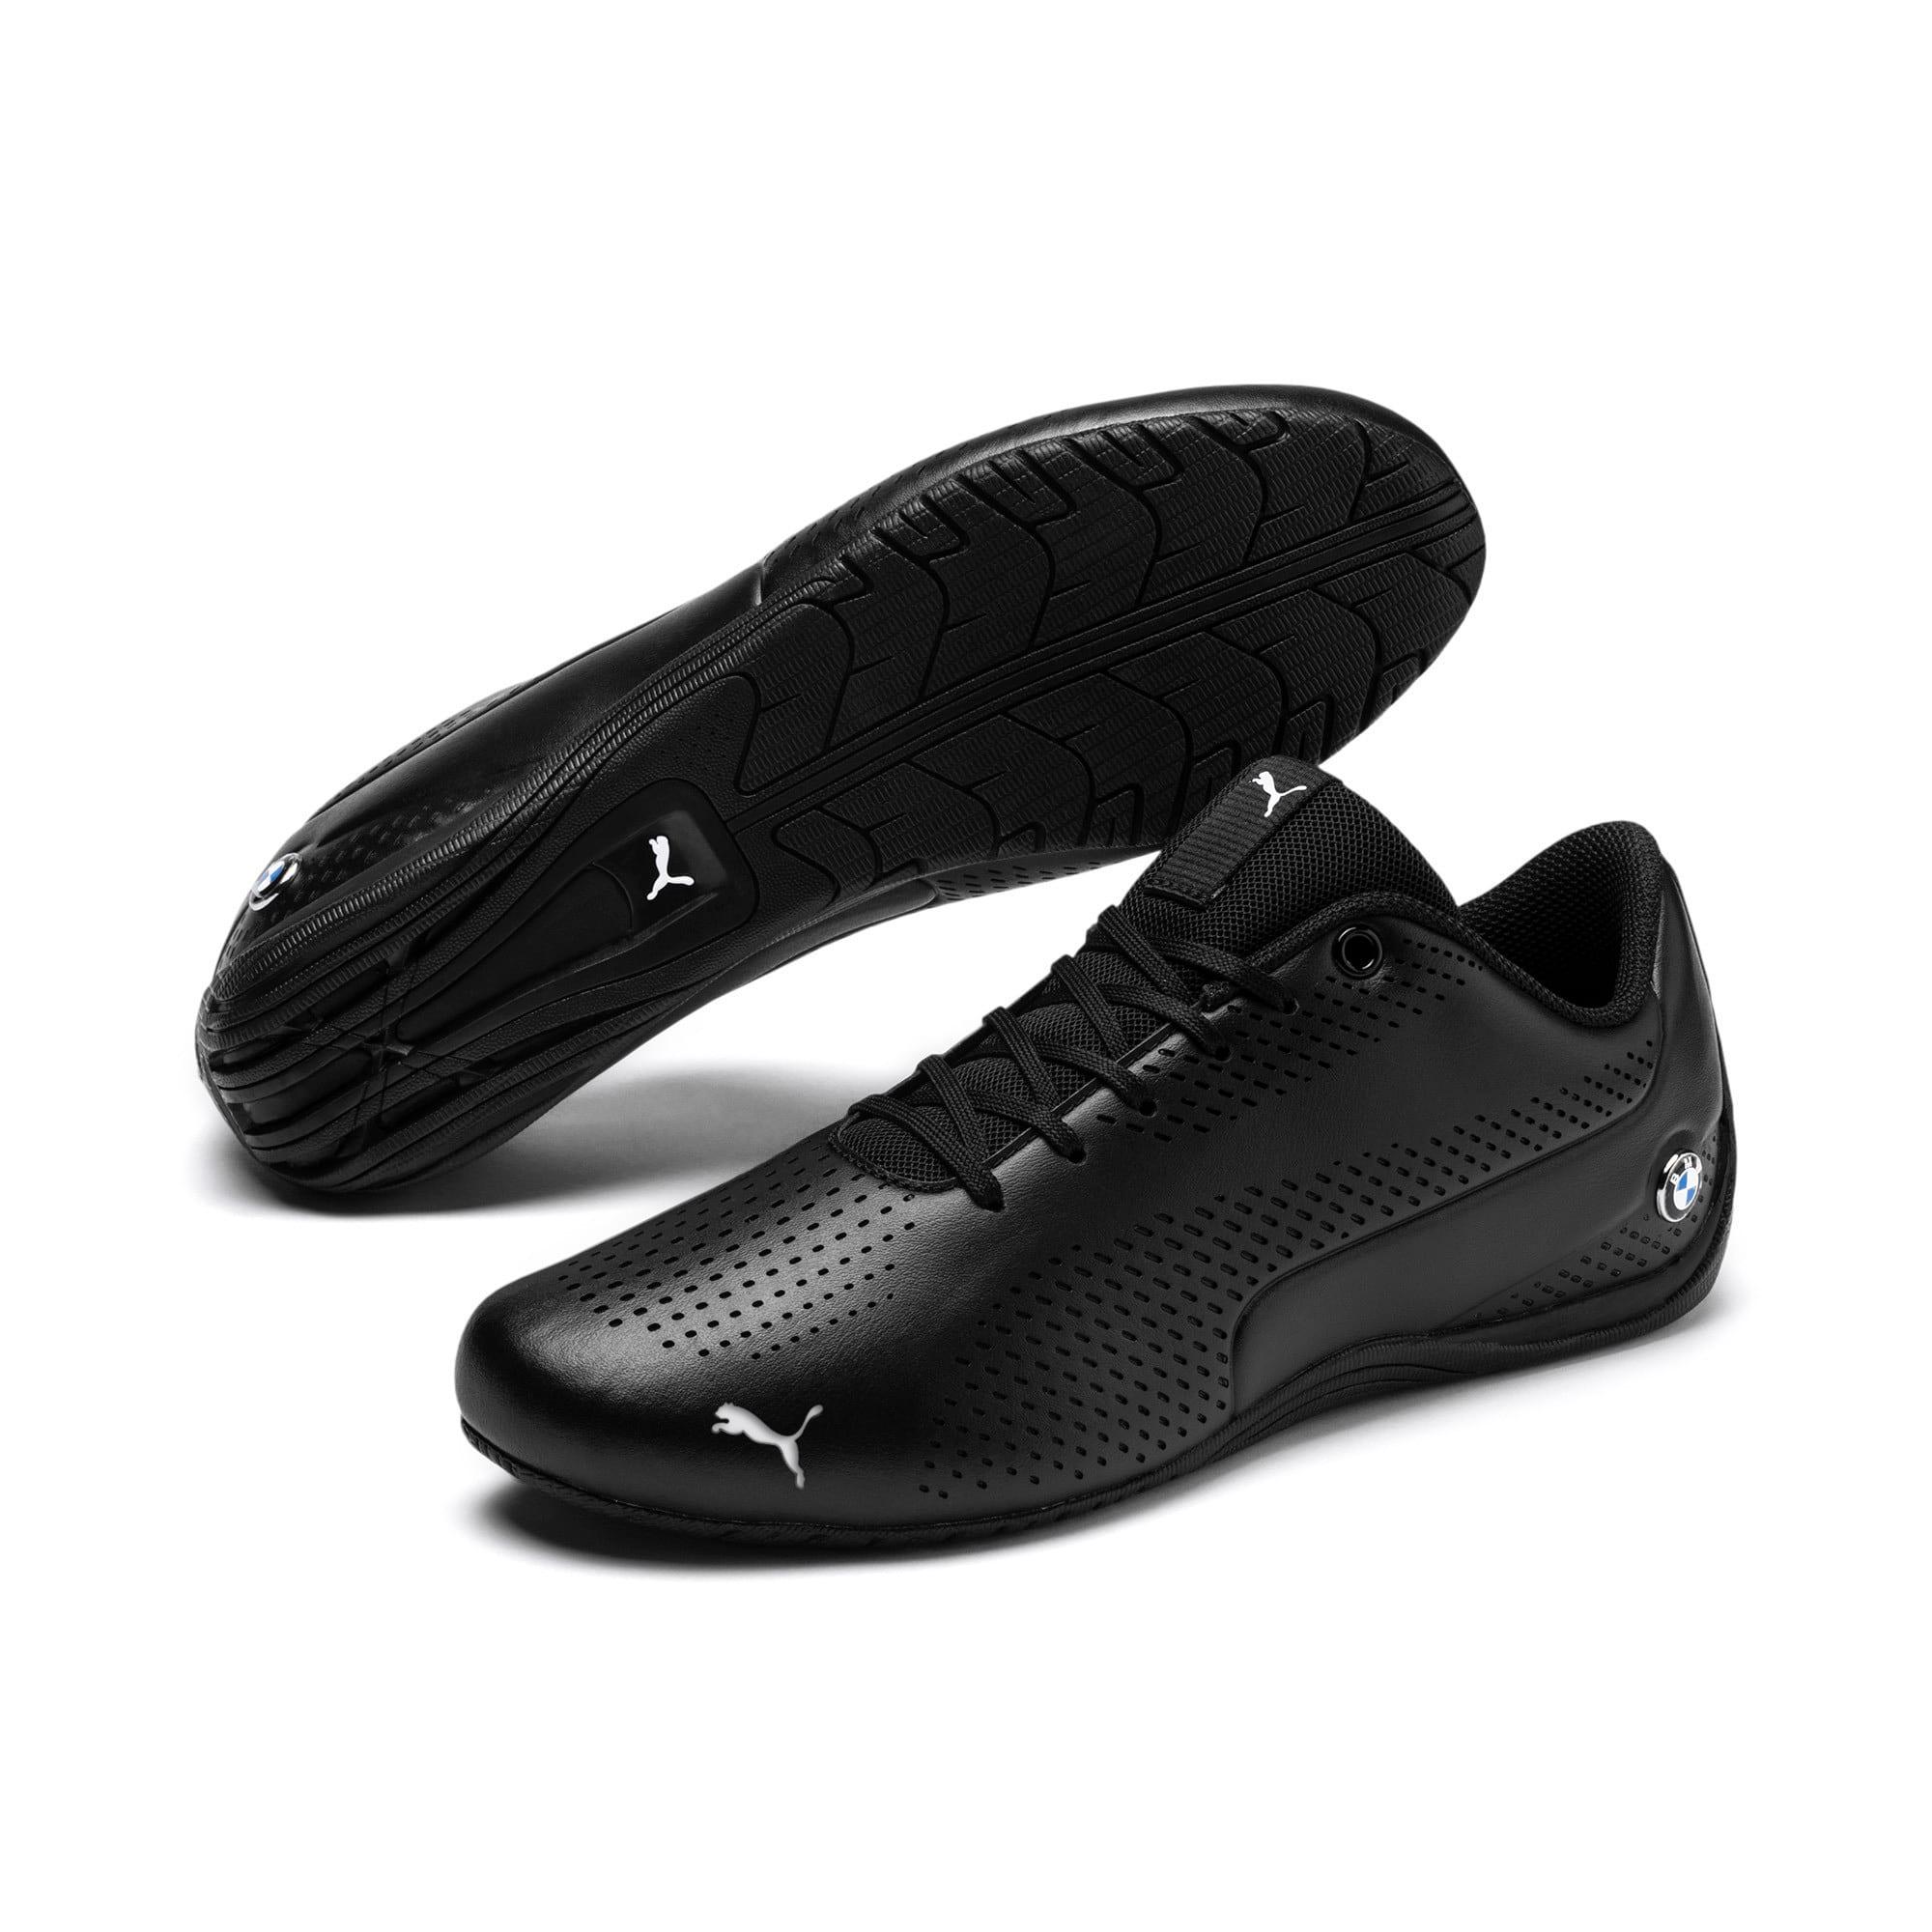 Thumbnail 2 of BMW M Motorsport Drift Cat 5 Ultra II Men's Shoes, Puma Black-Puma Black, medium